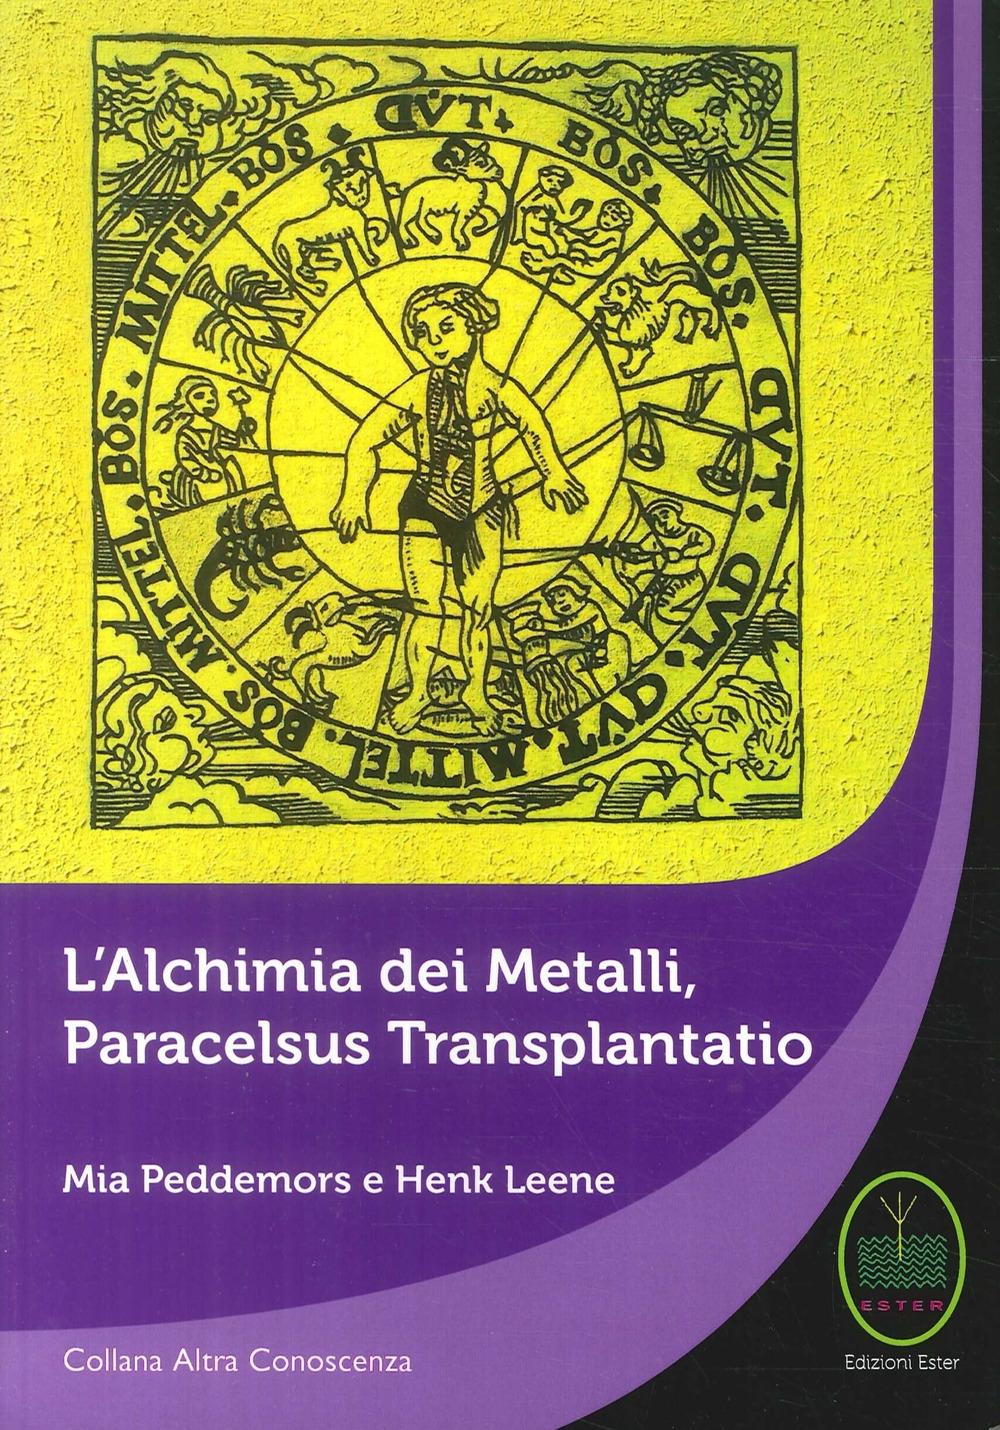 L'Alchimia dei Metalli, Paracelsus Transplantatio.